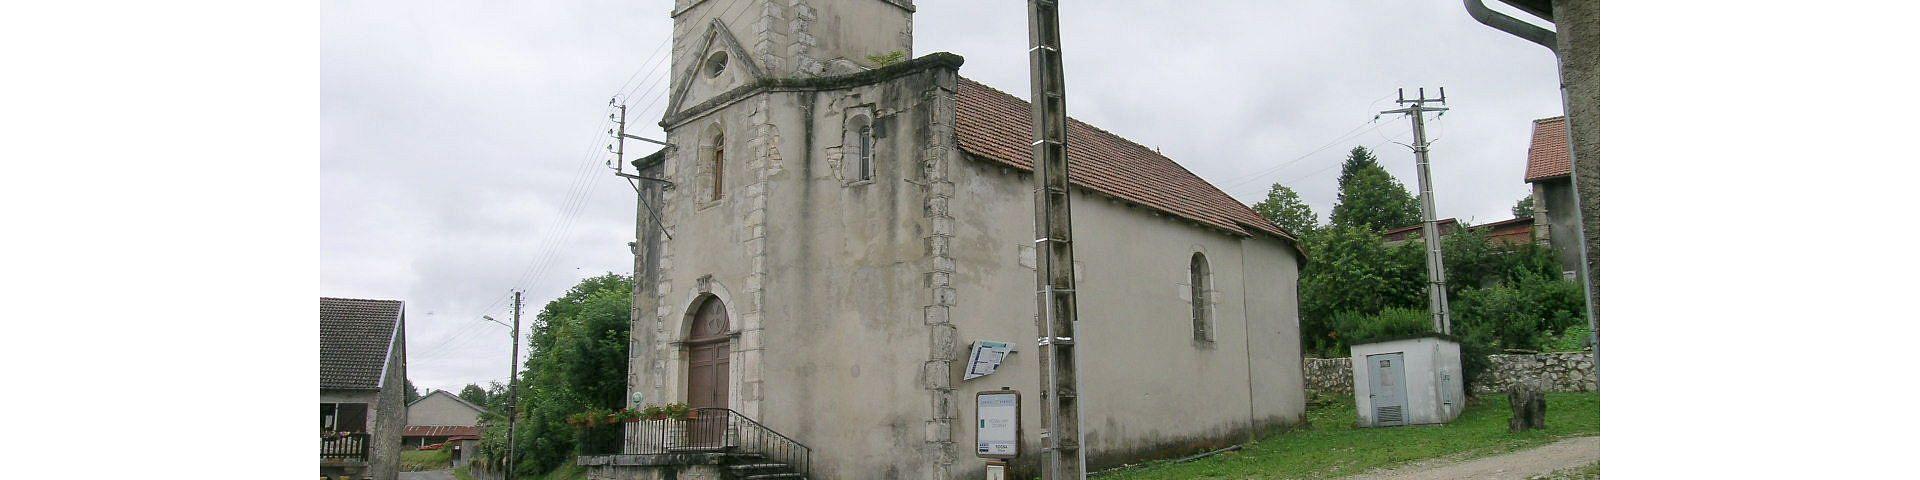 Rogna-Eglise (39)